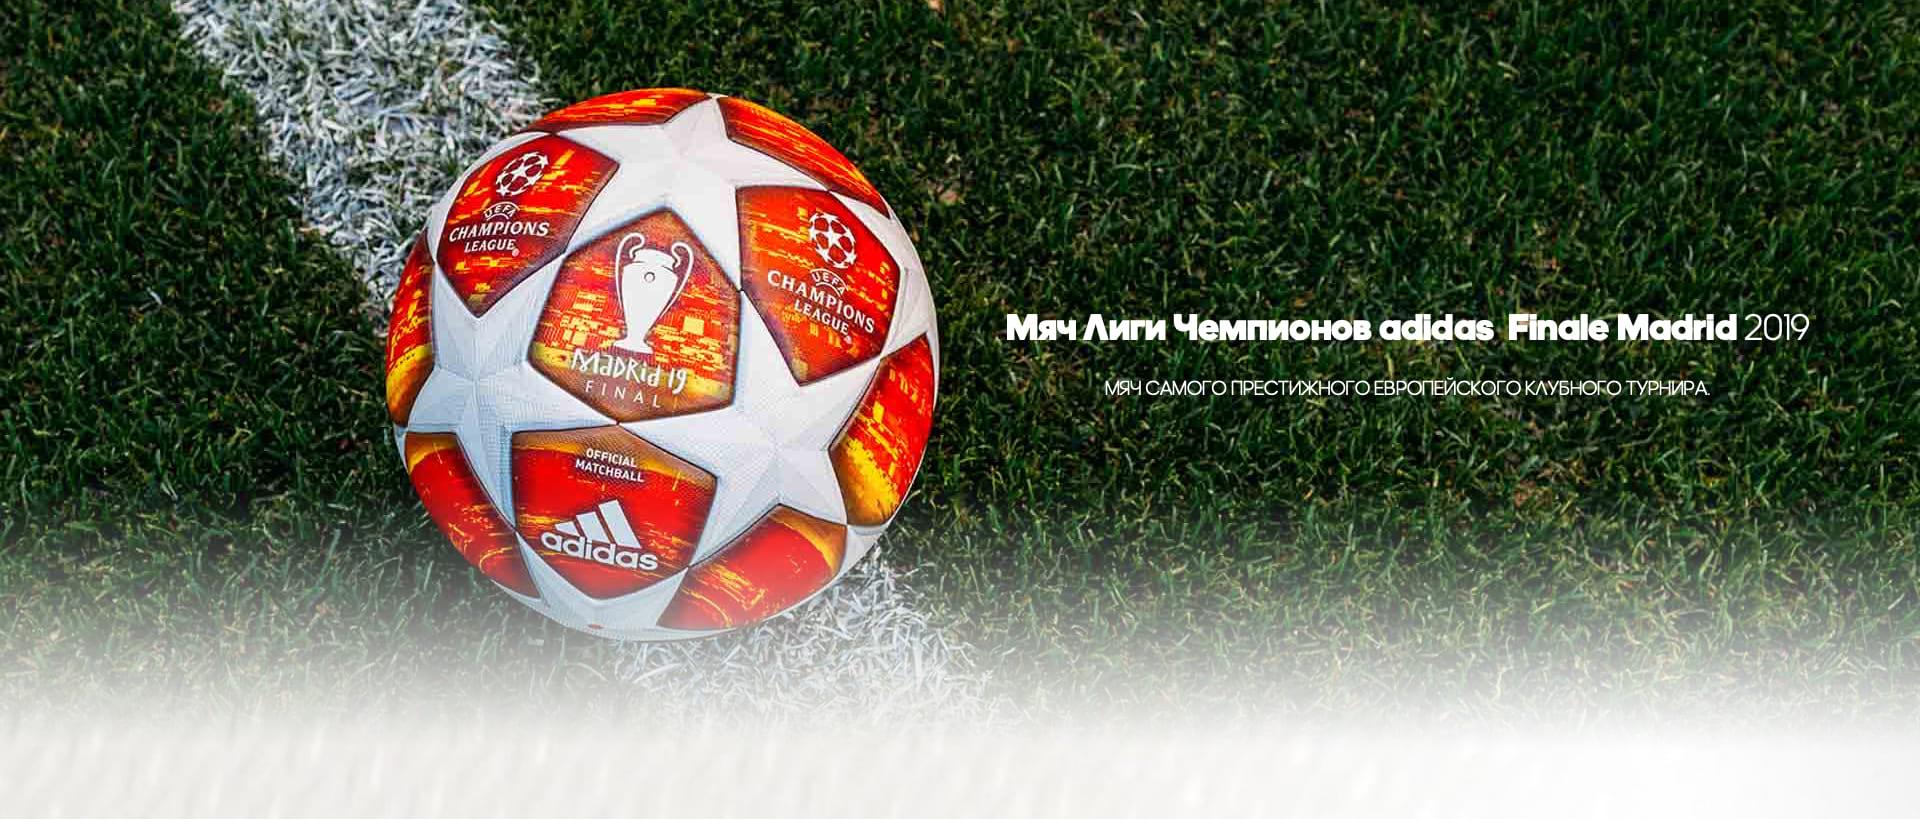 myach_ligi_chempionov_adidas_finale_madrid_2019.jpg